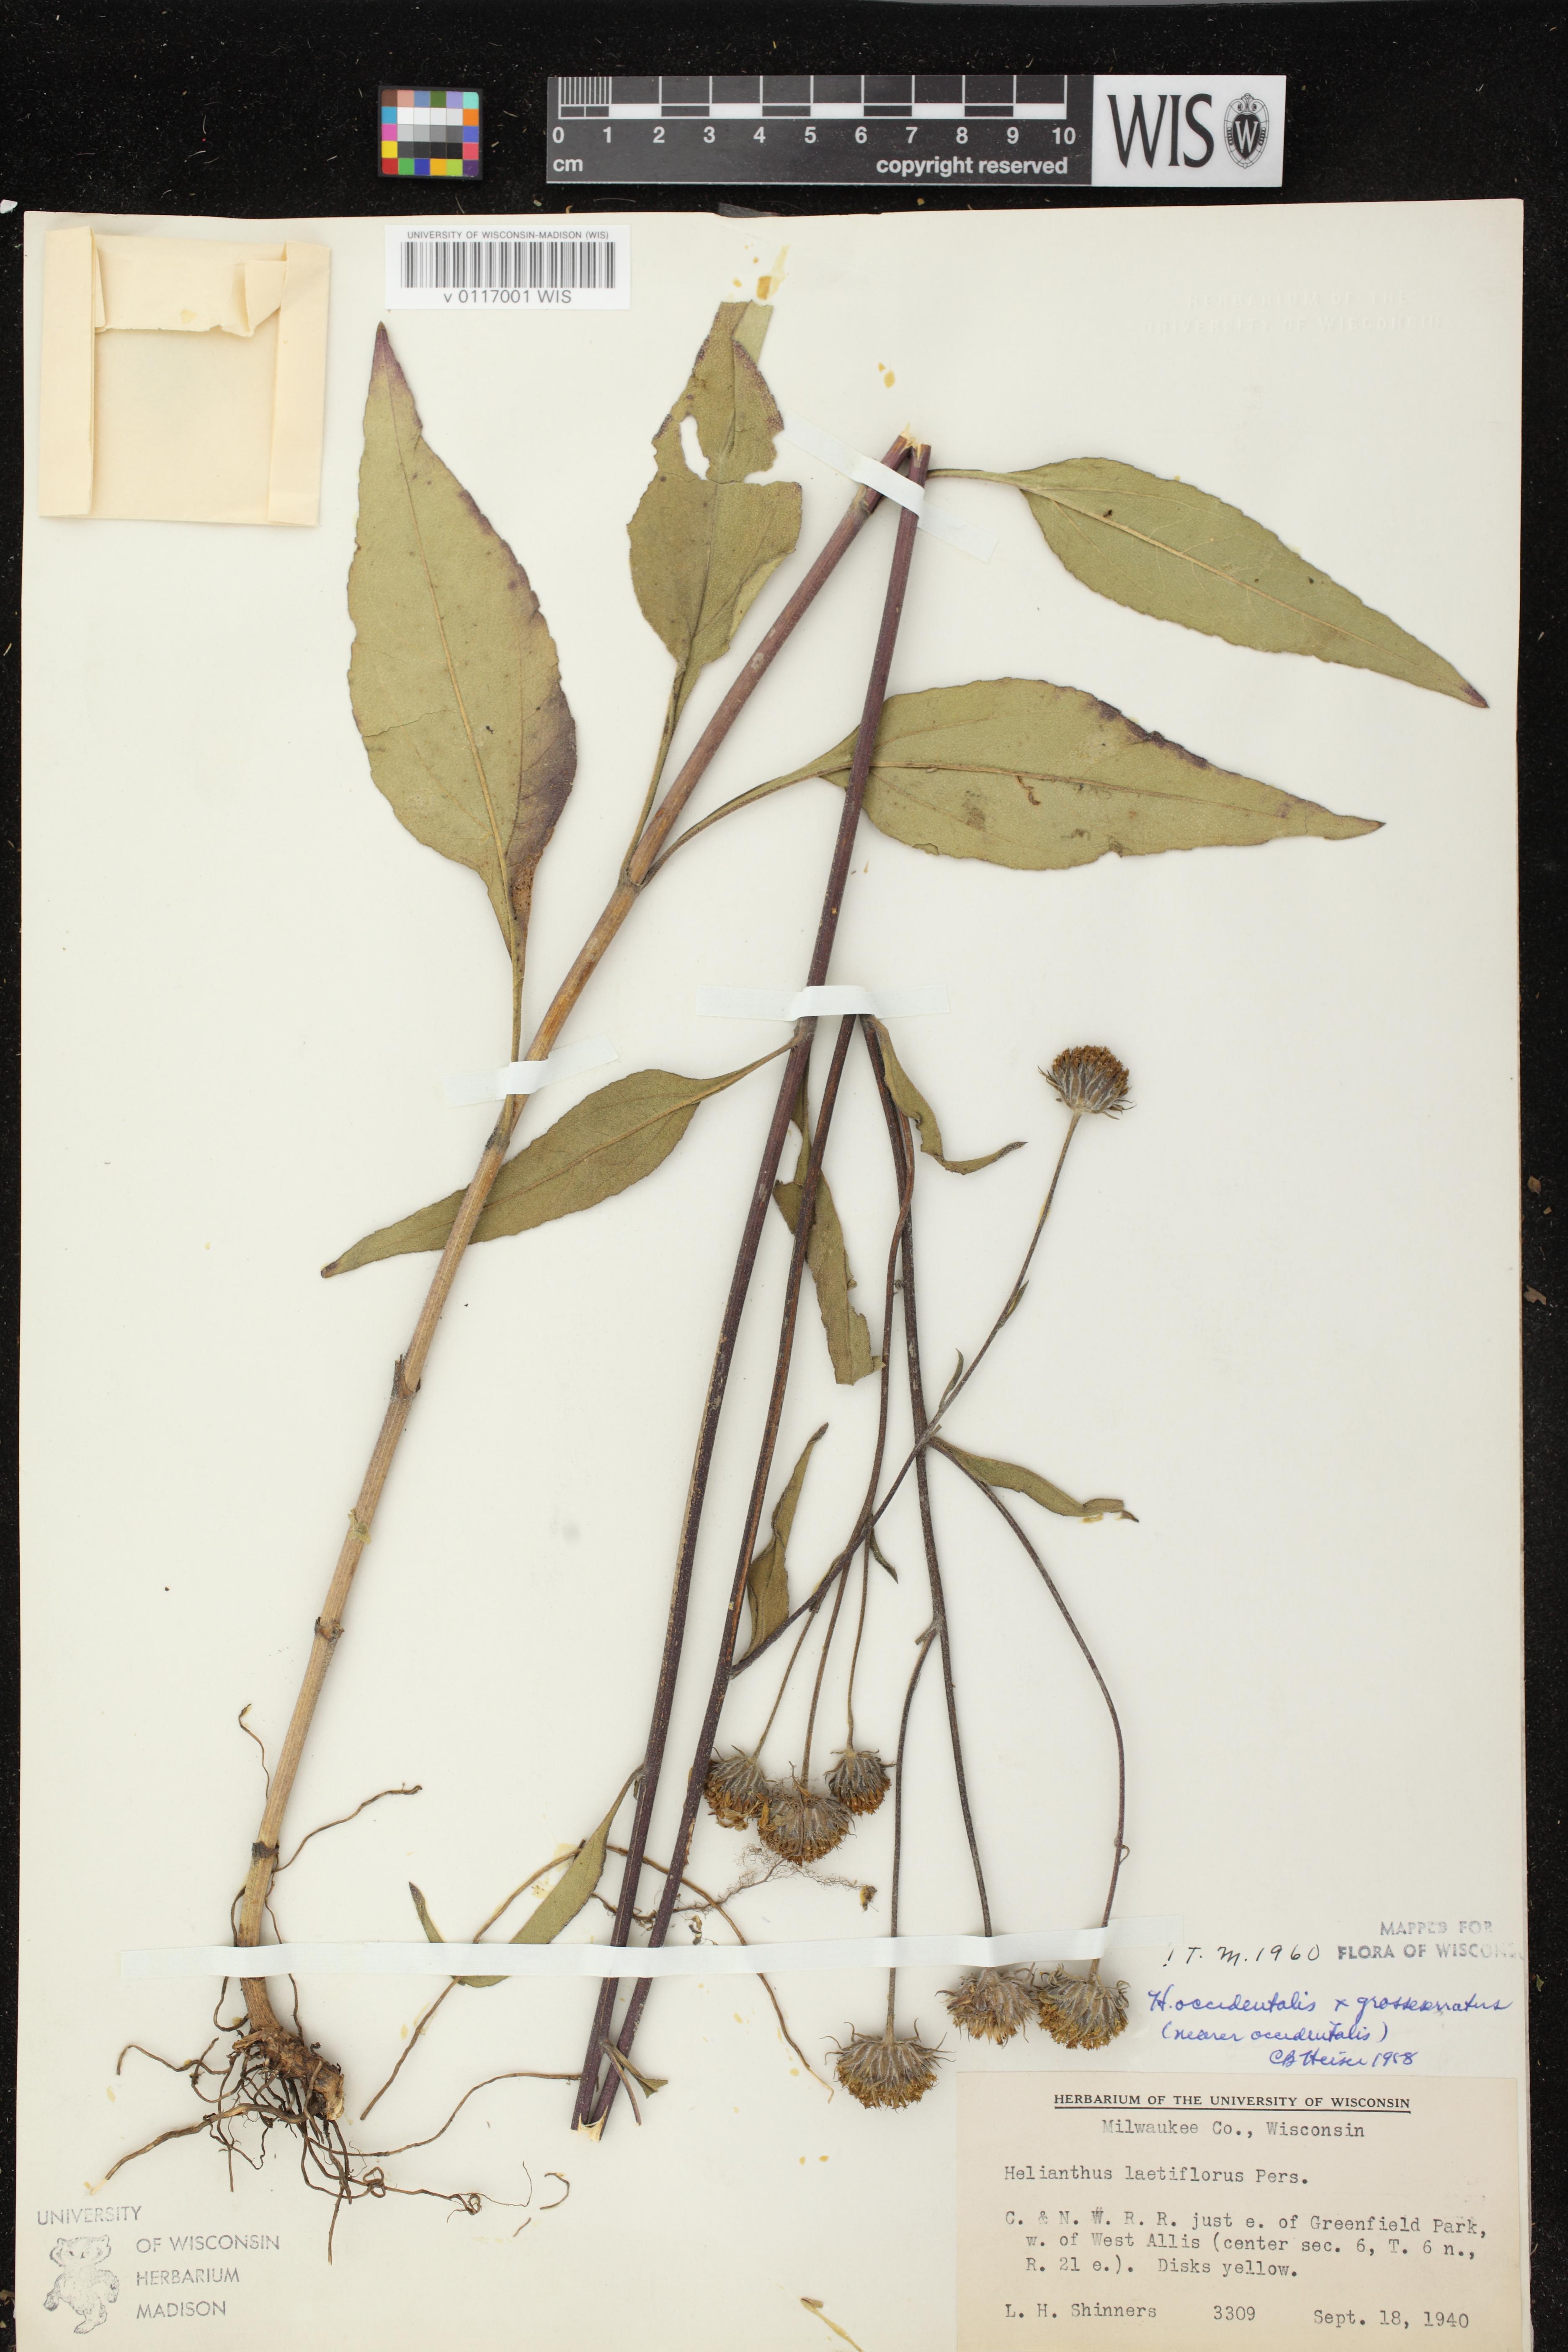 Image of Helianthus grosseserratus x h. occidentalis